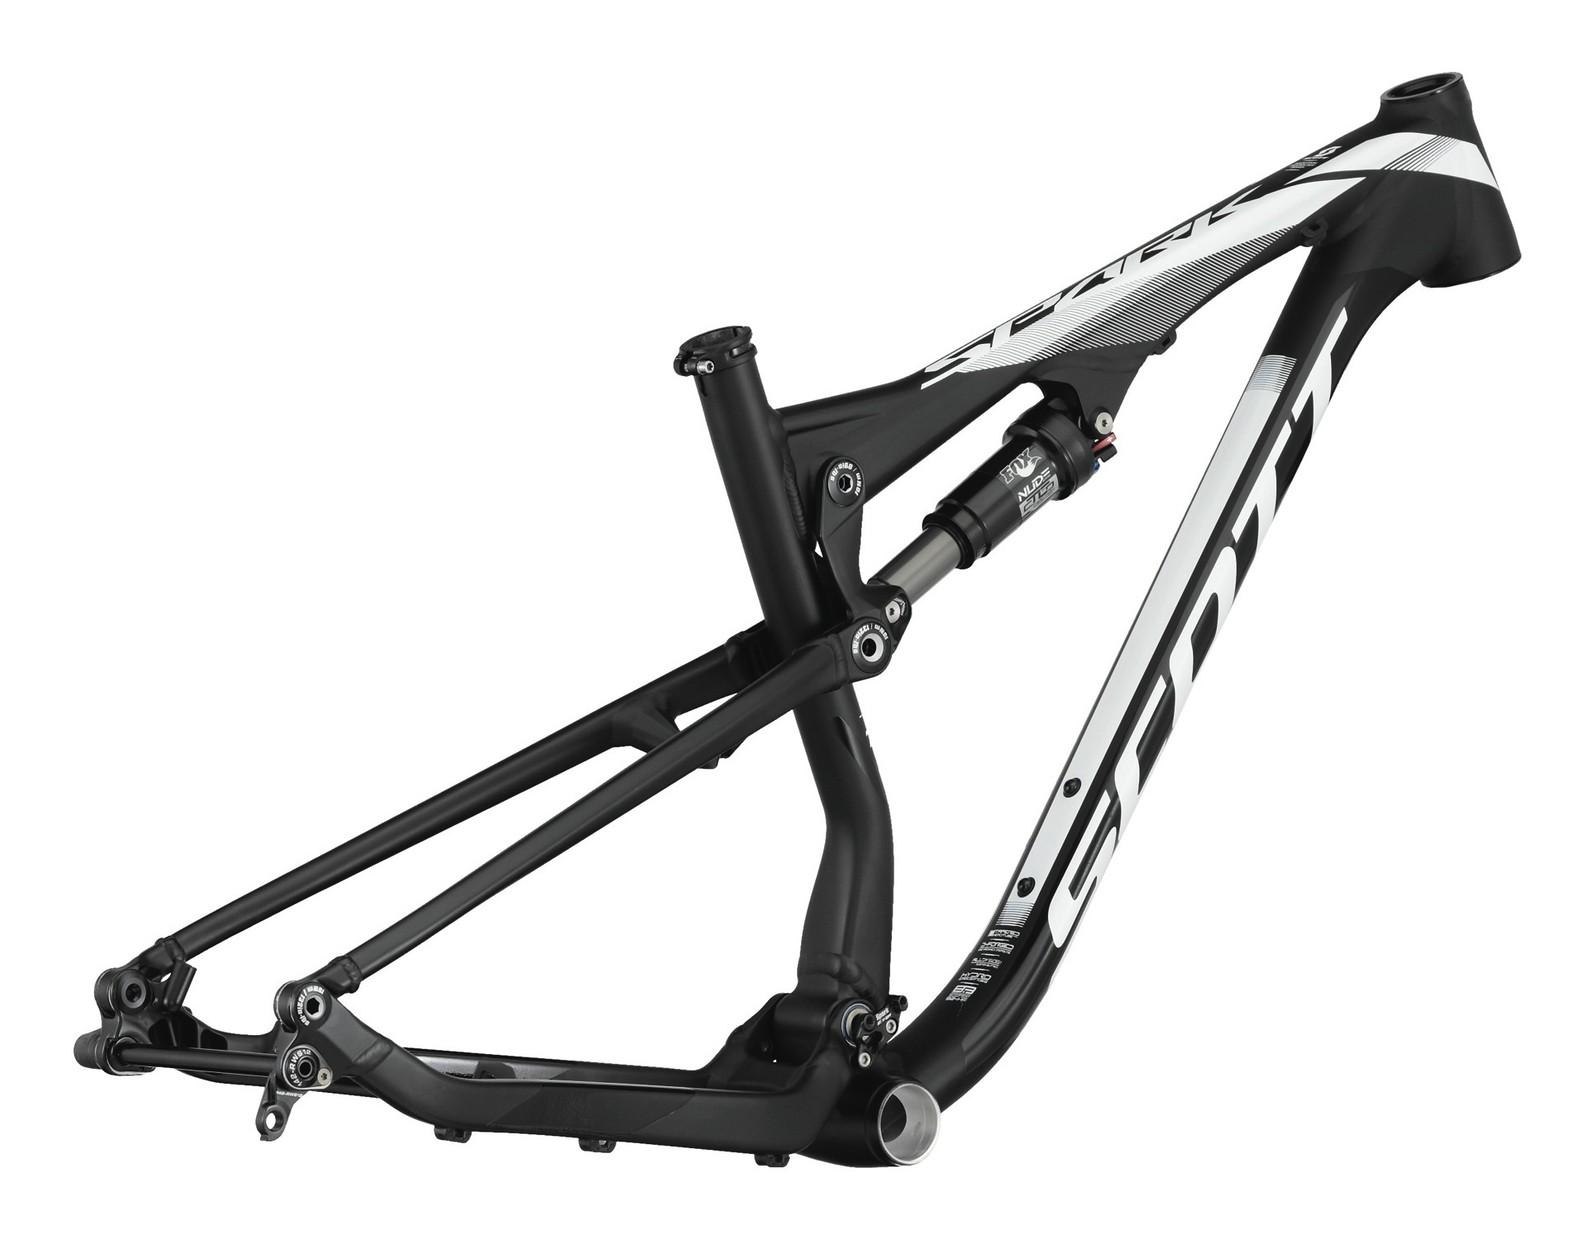 Scott Spark 740 Frame - Reviews, Comparisons, Specs - Mountain Bike ...